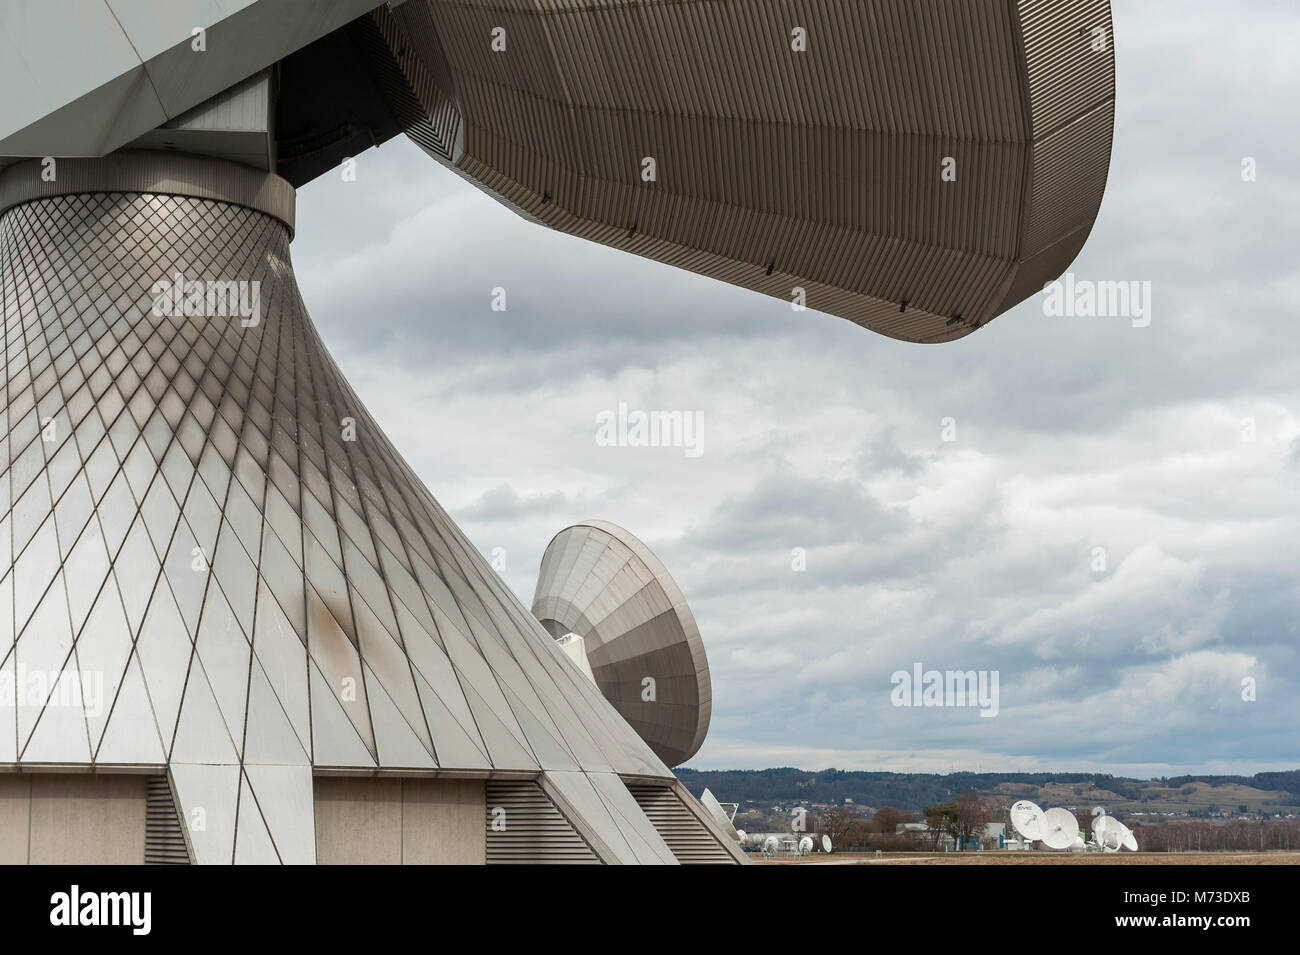 Erdfunkstelle Raisting, Bayern, Deutschland Stockbild